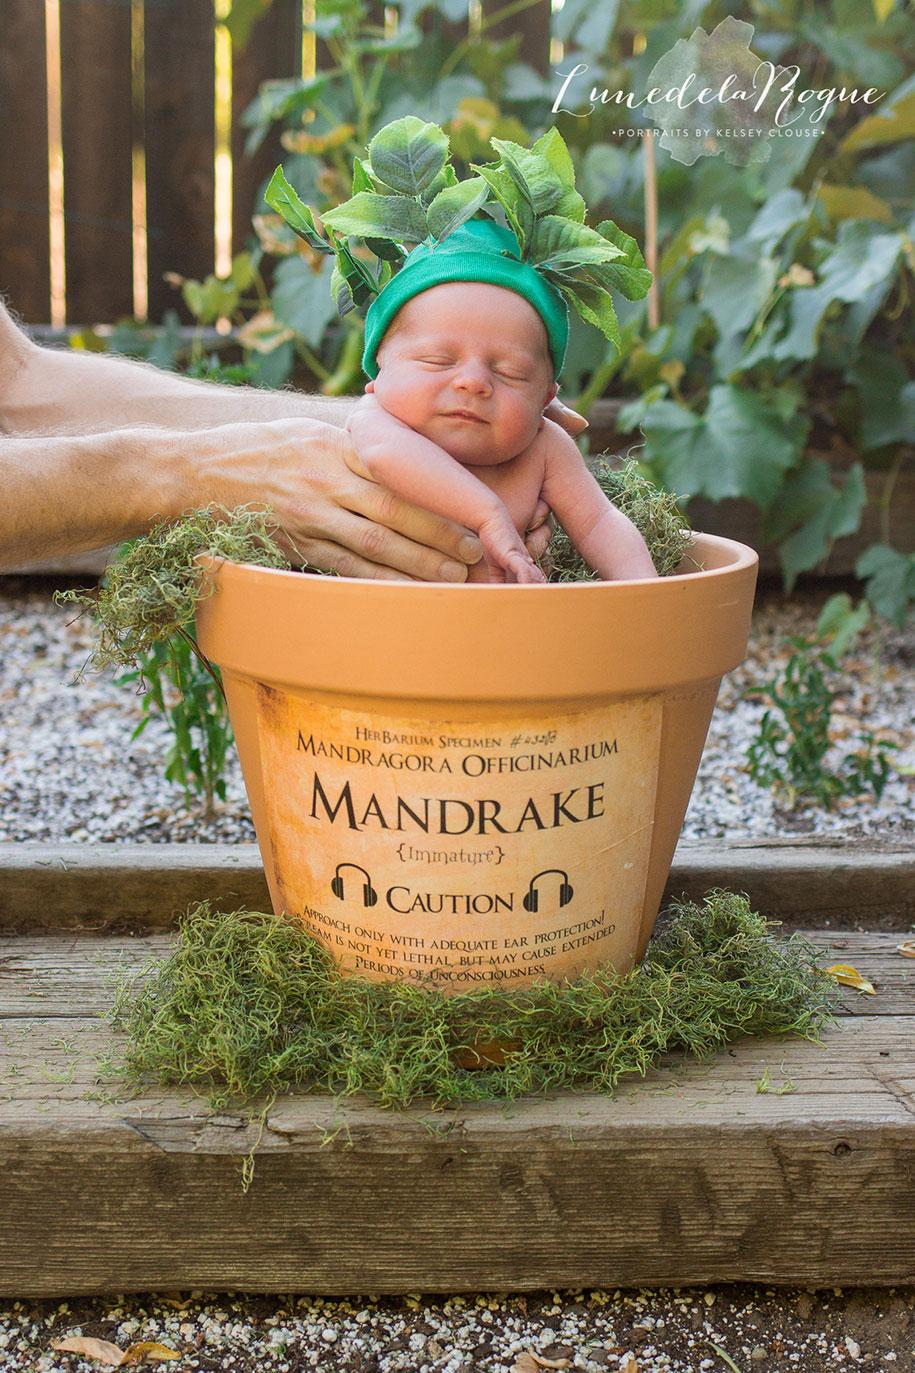 harry-potter-themed-newborn-photoshoot-kelsey-clouse-1